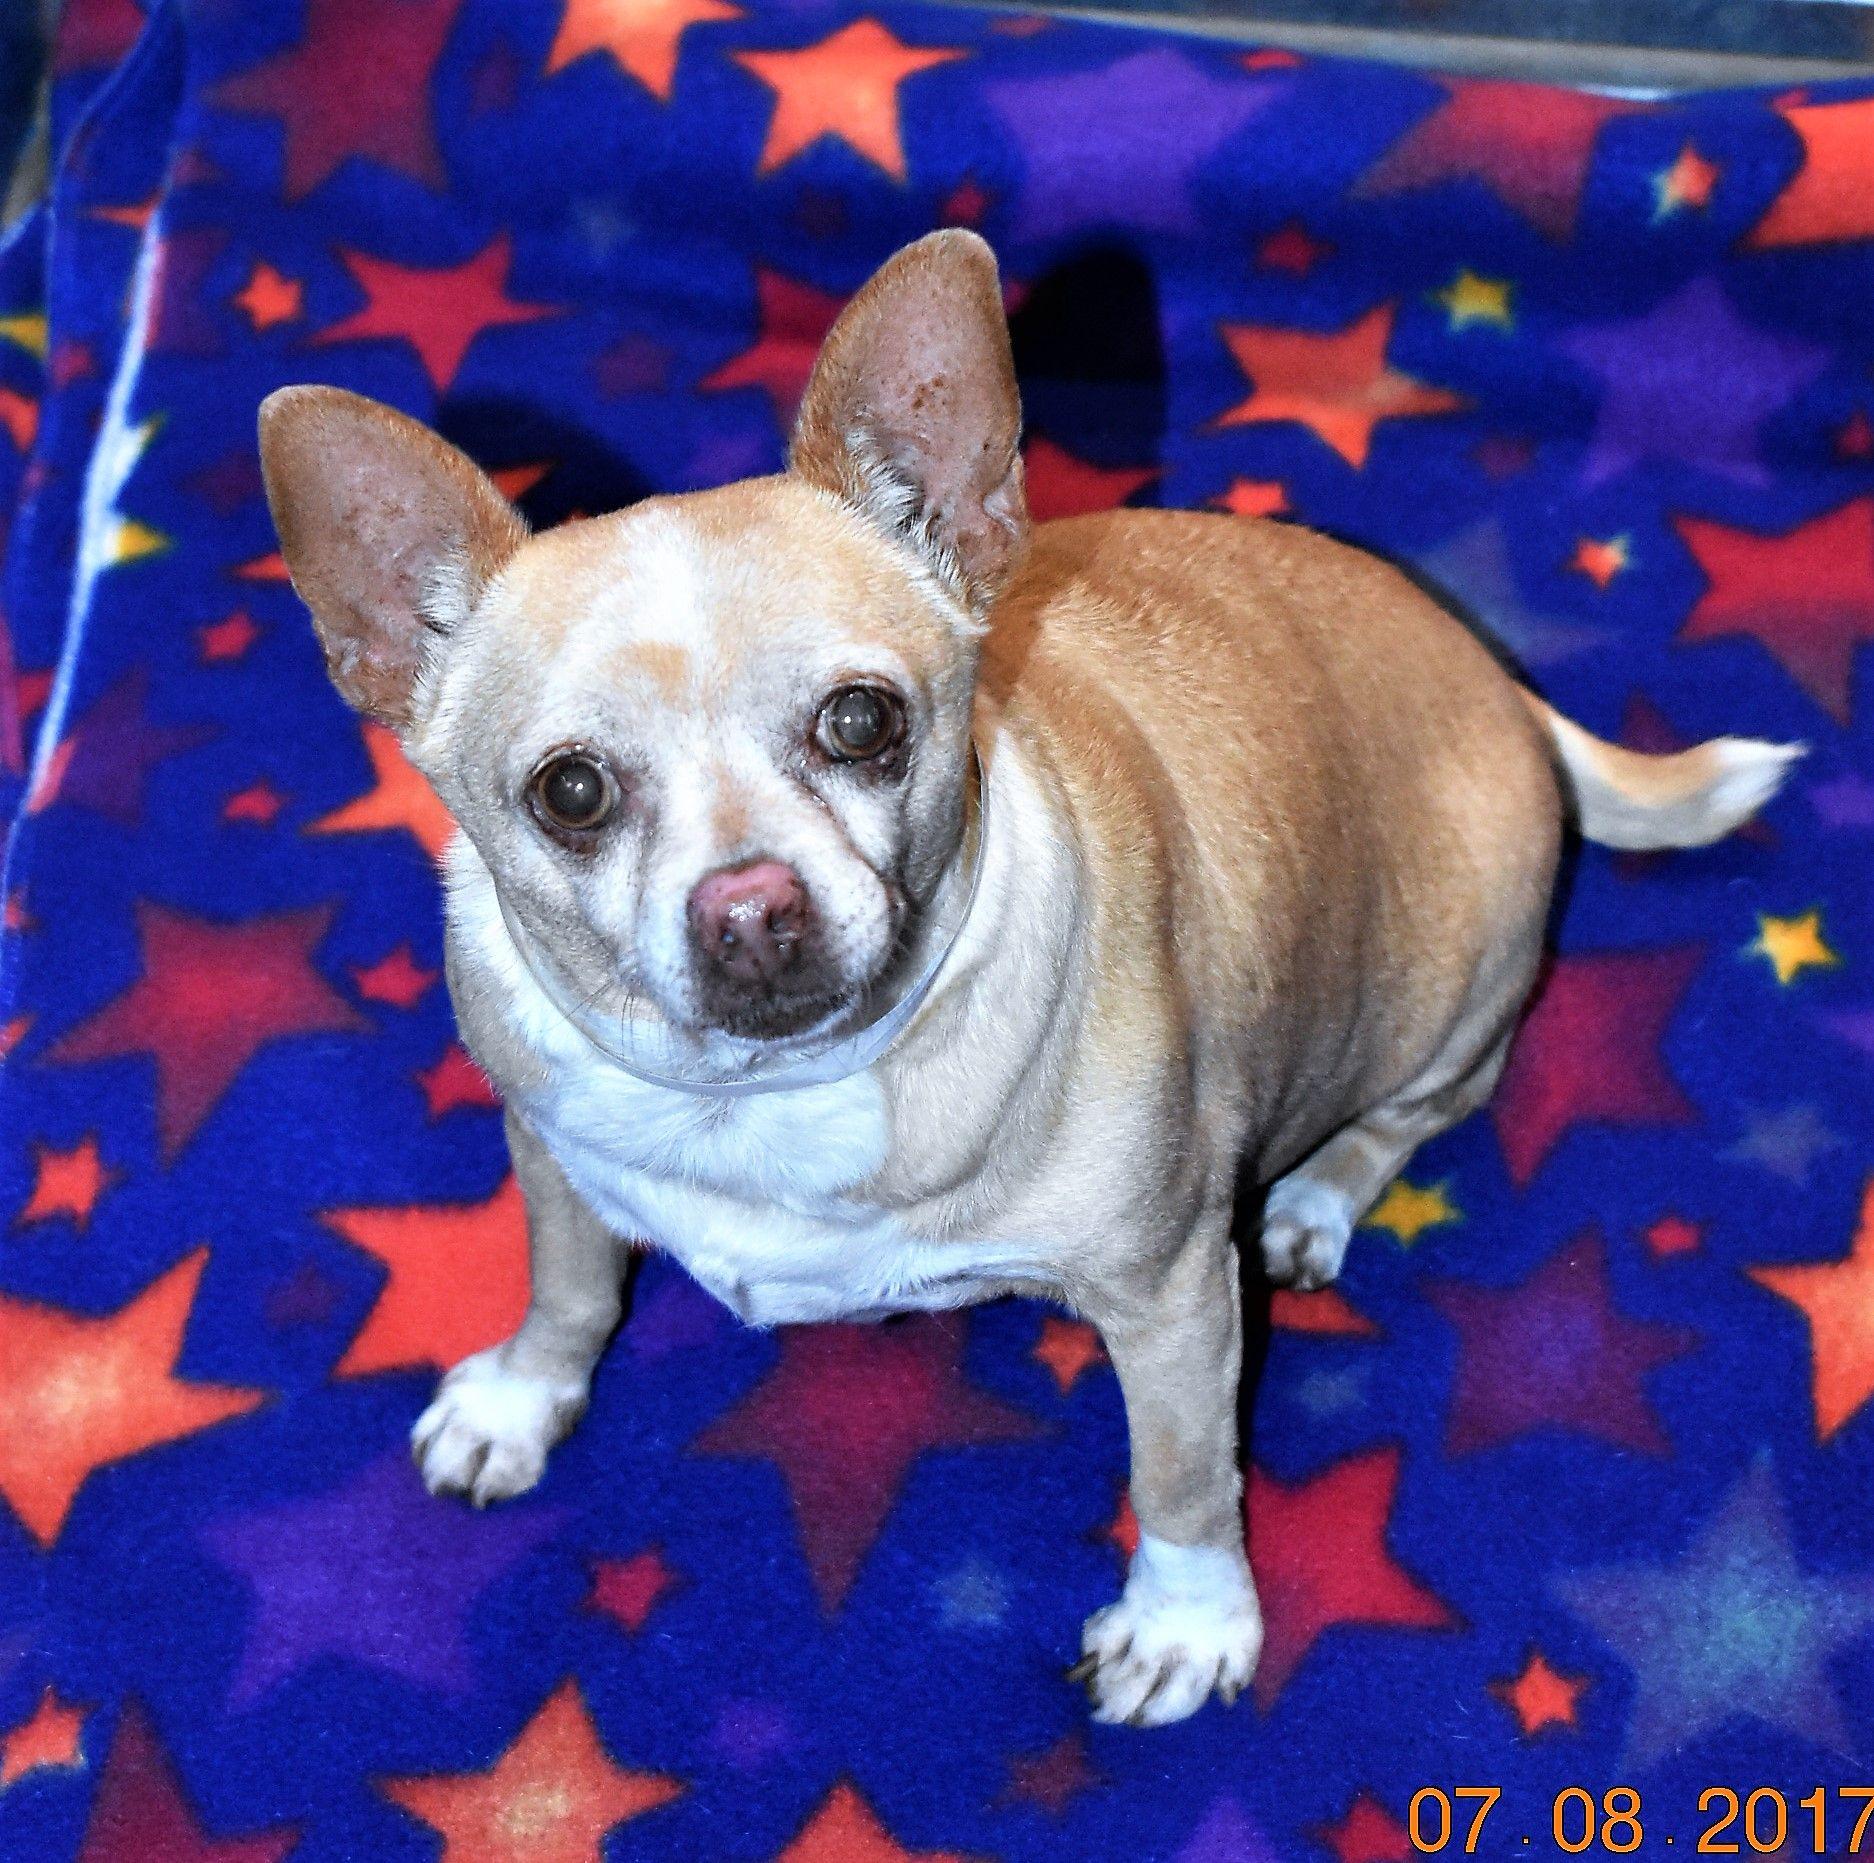 Chihuahua dog for Adoption in San Jacinto, CA. ADN591928